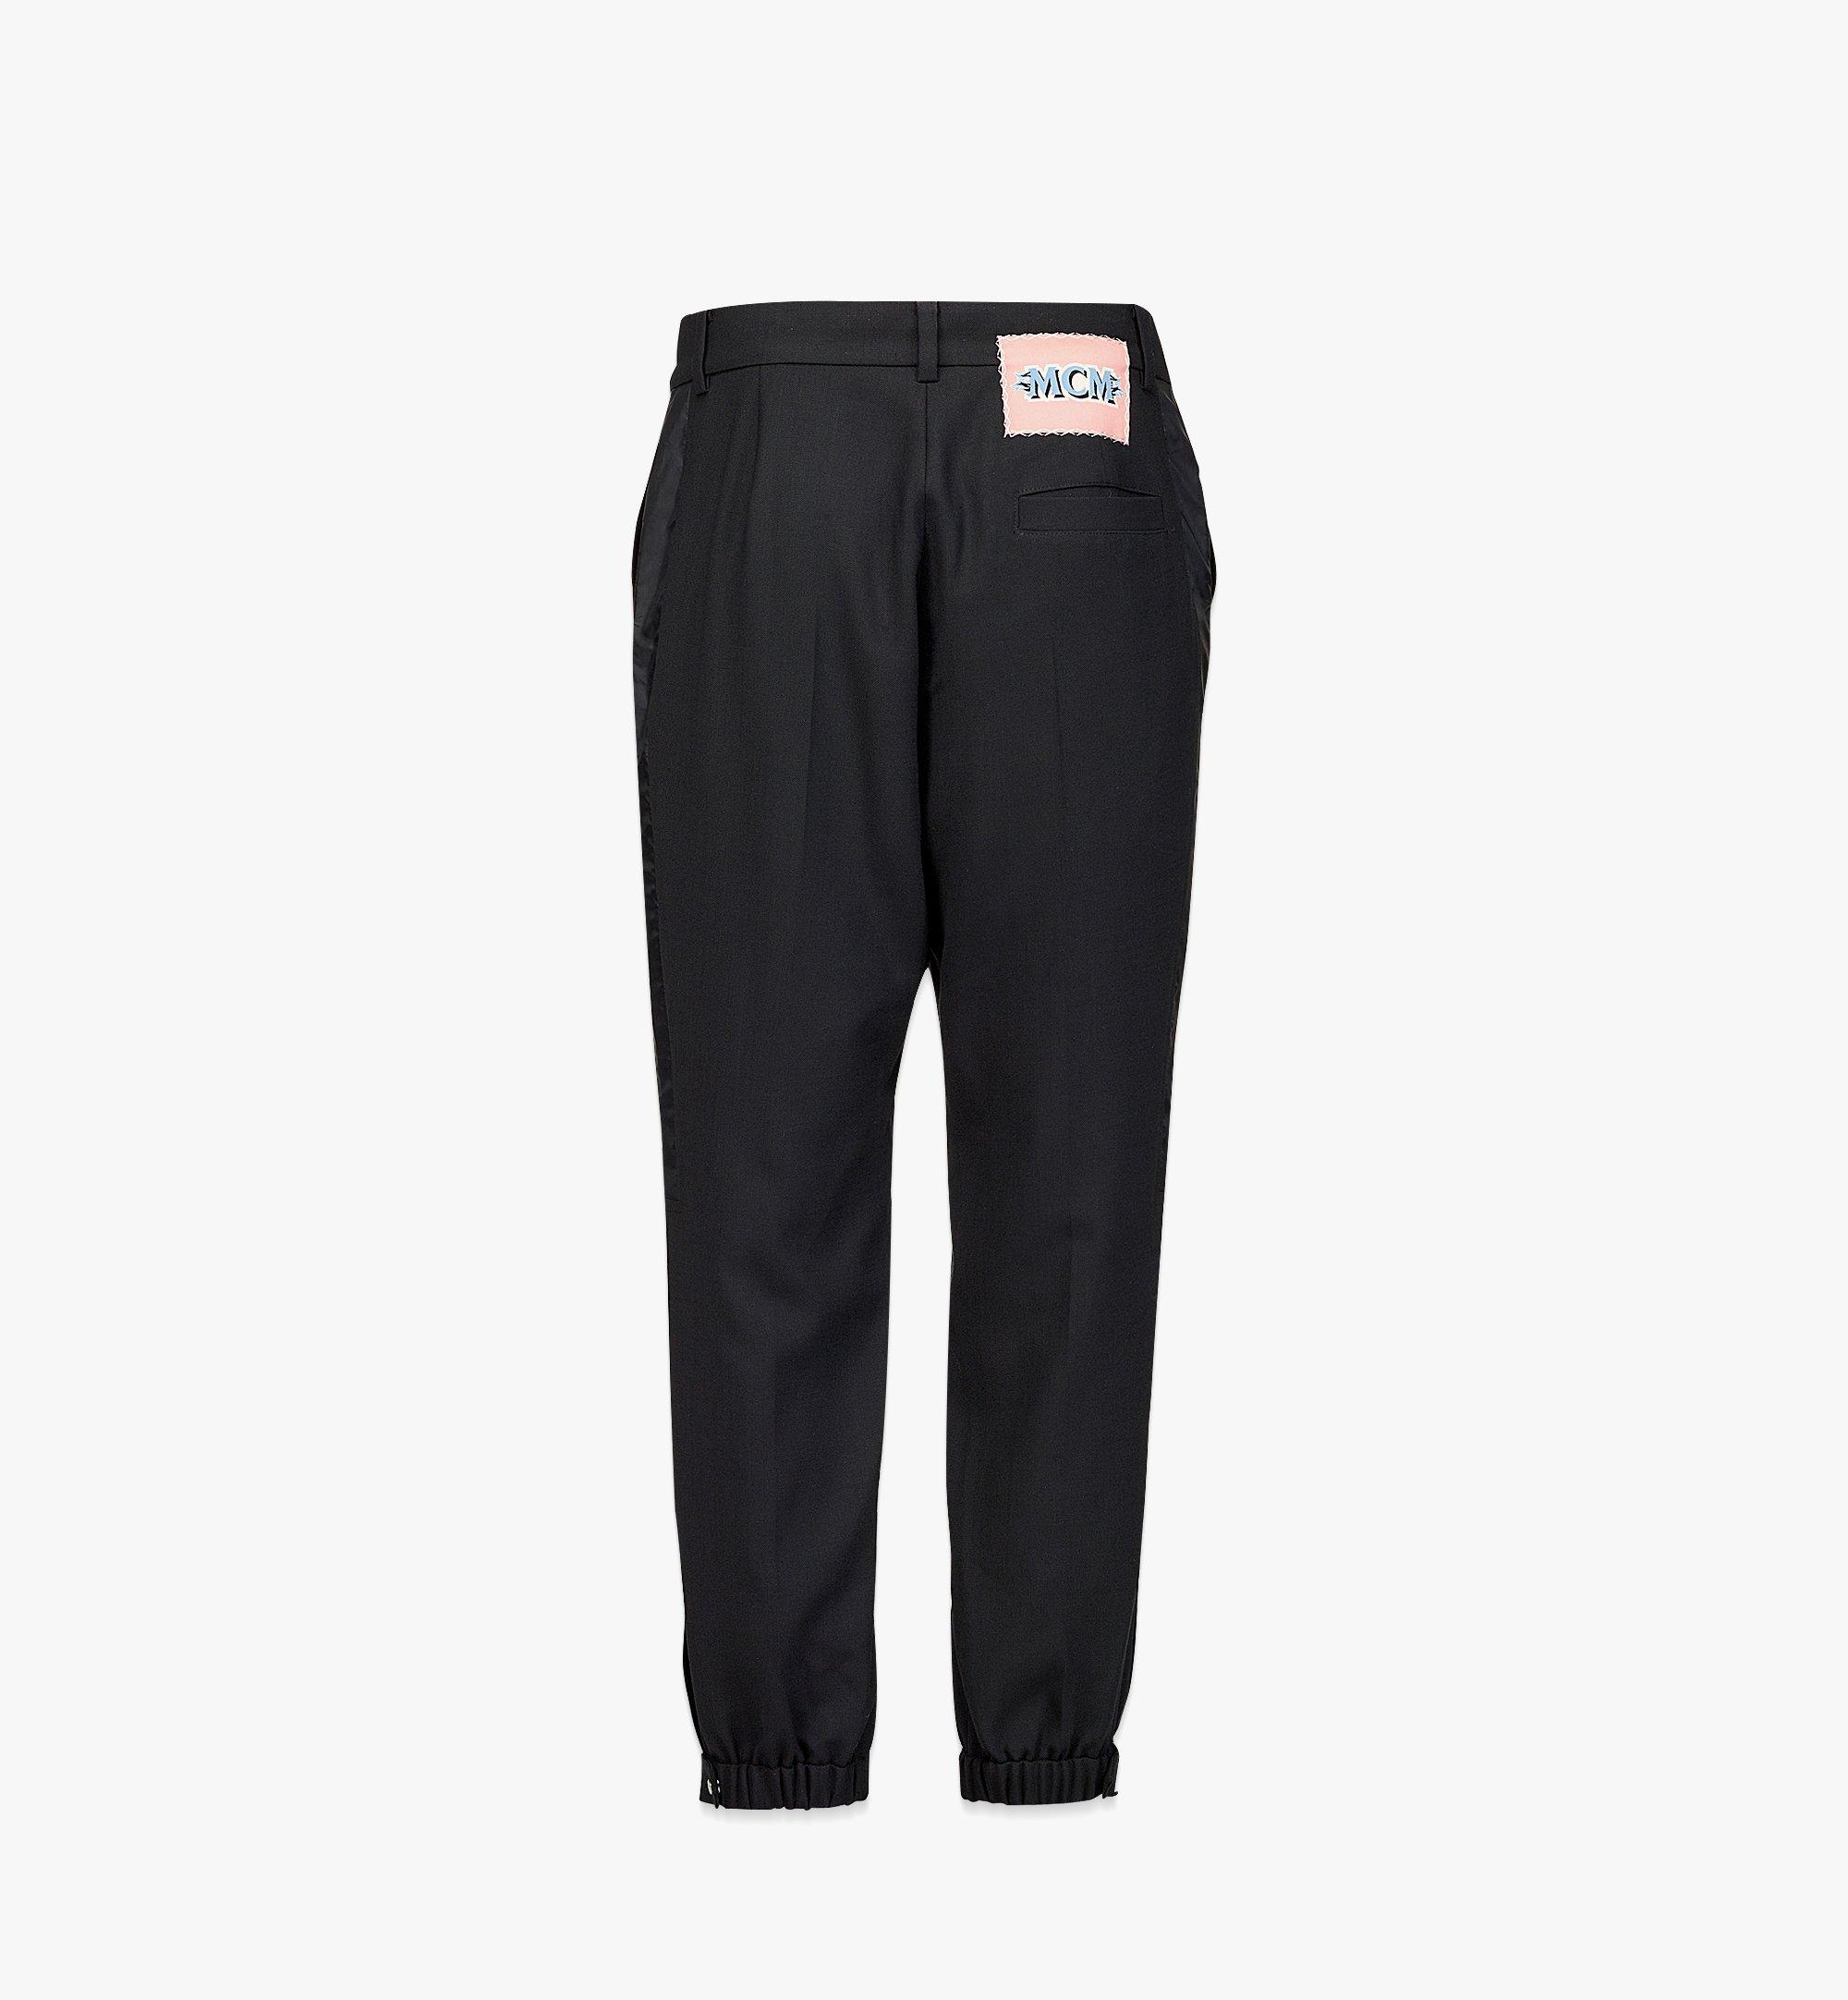 MCM Men's Wool Sweatpants Black MHPBAMM02BK048 Alternate View 1